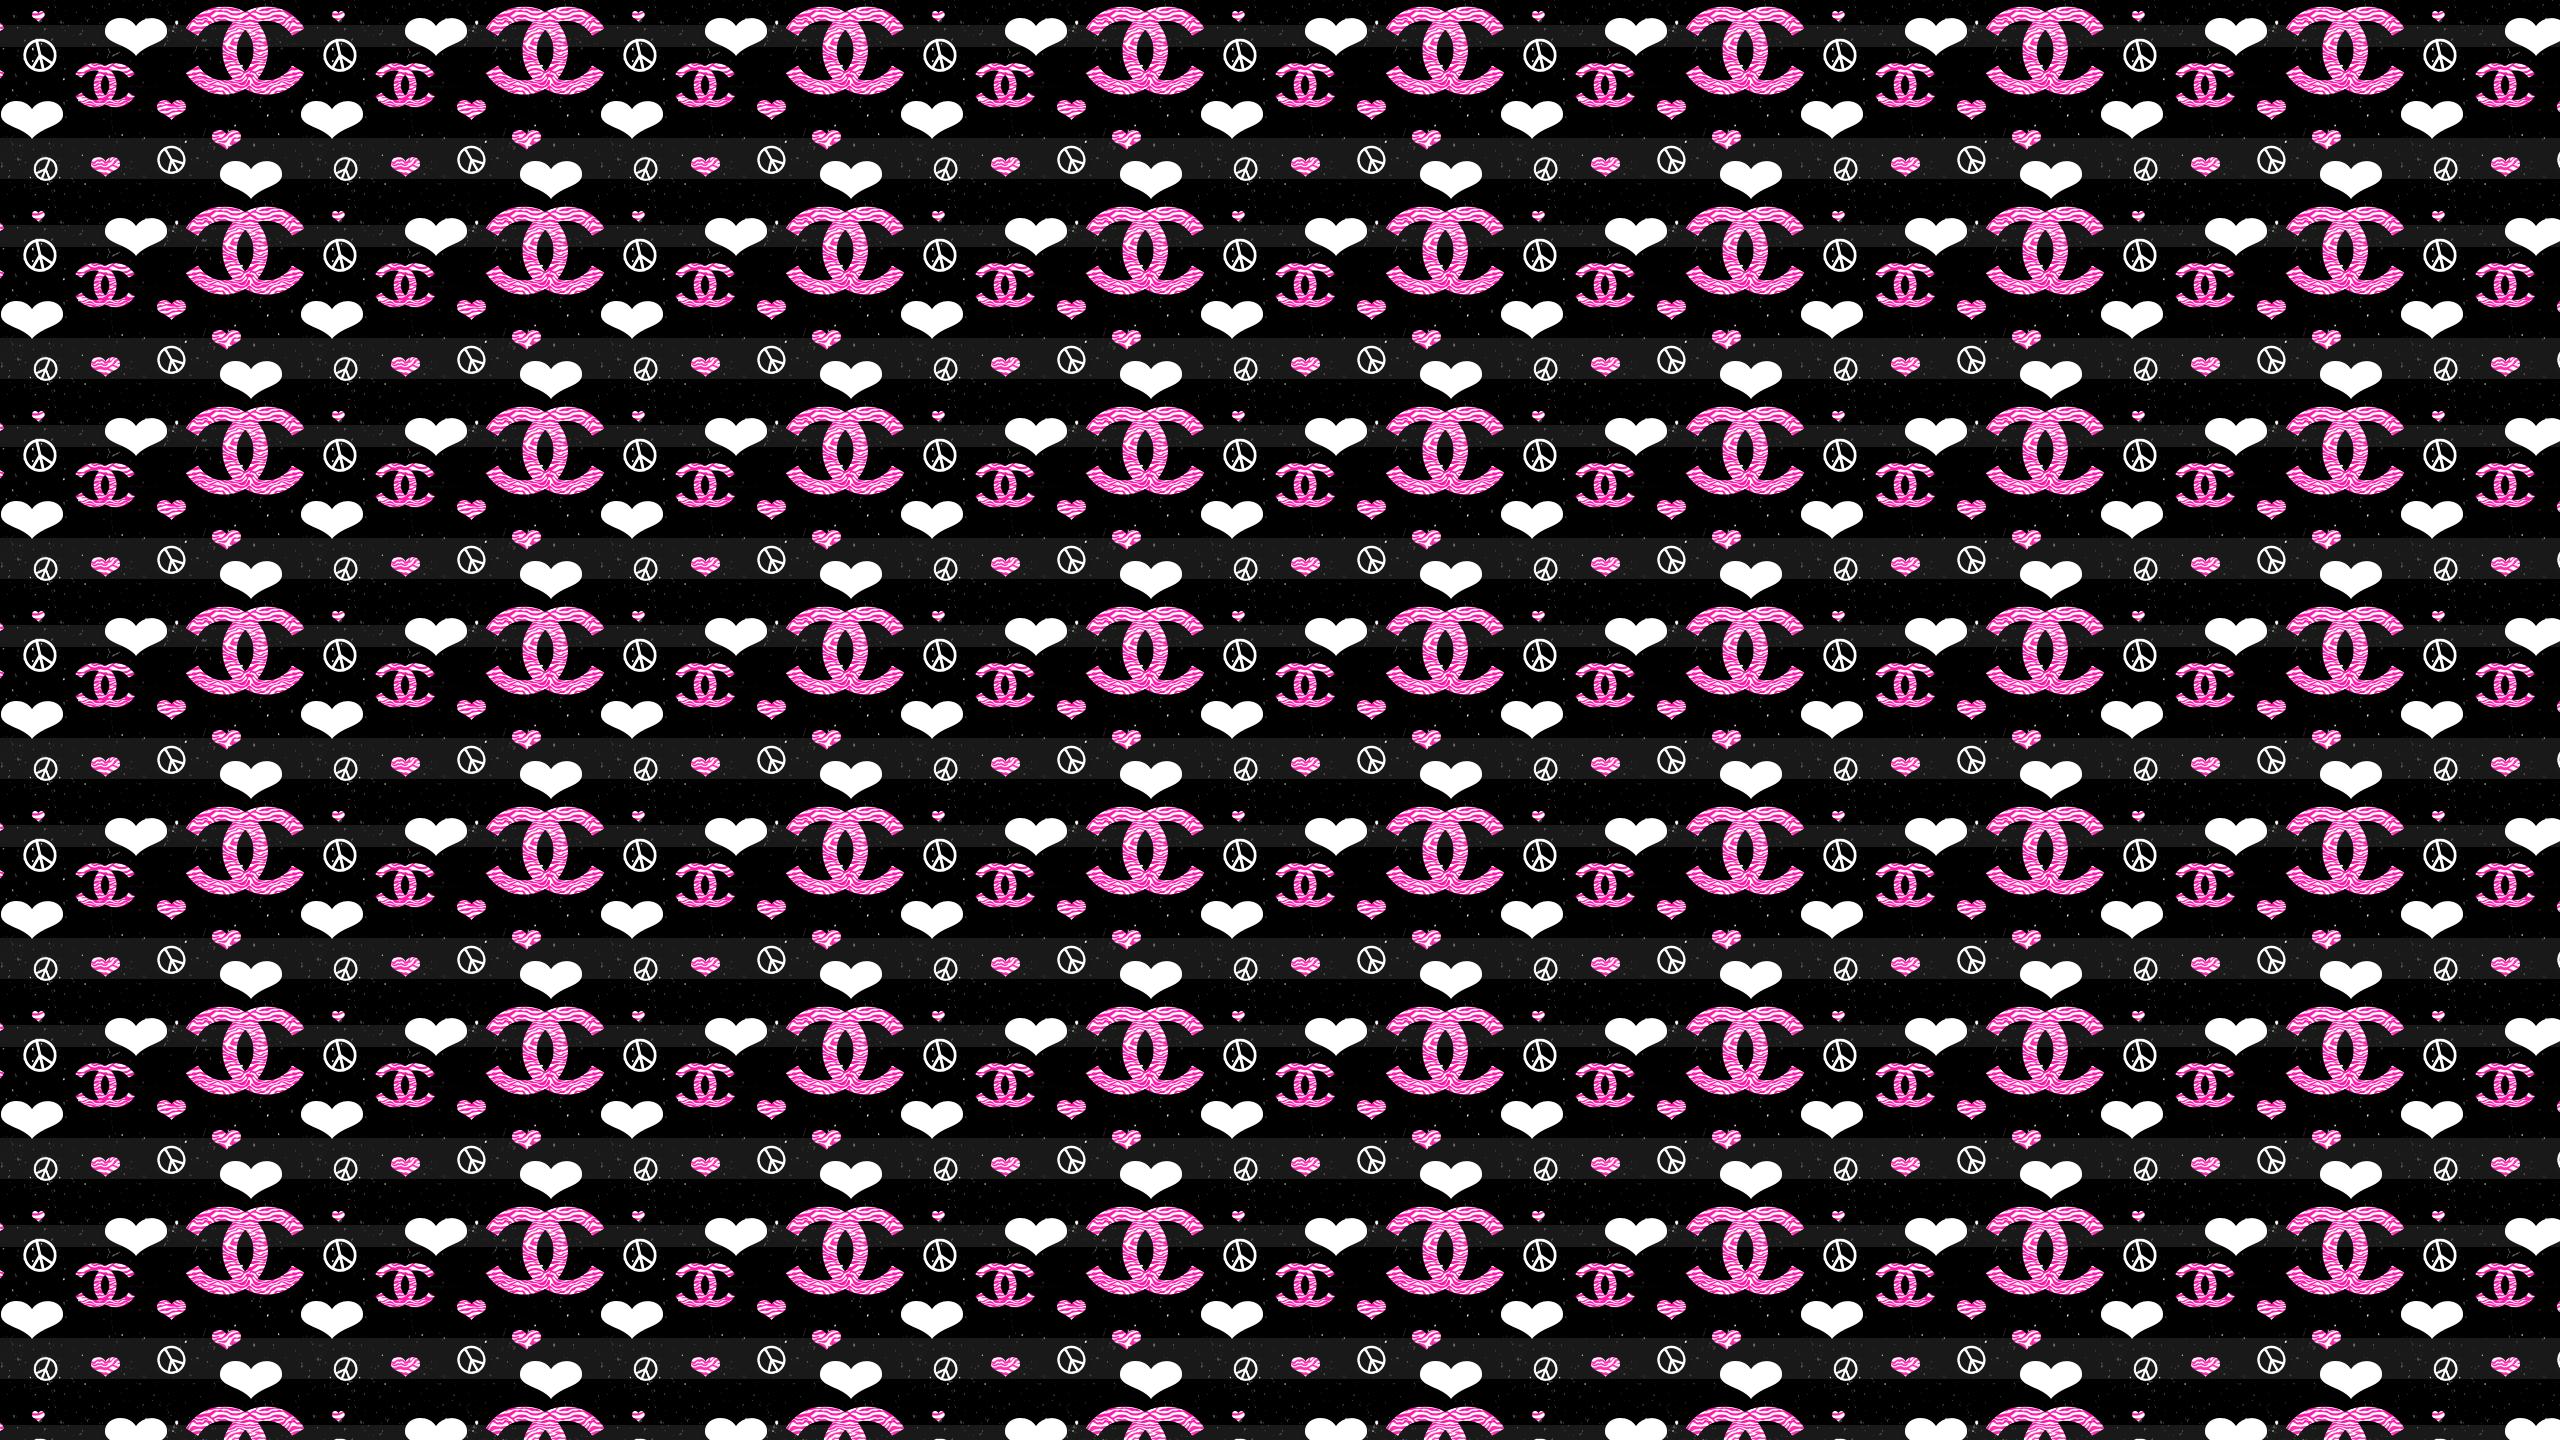 Chanel Desktop Wallpaper 2560x1440